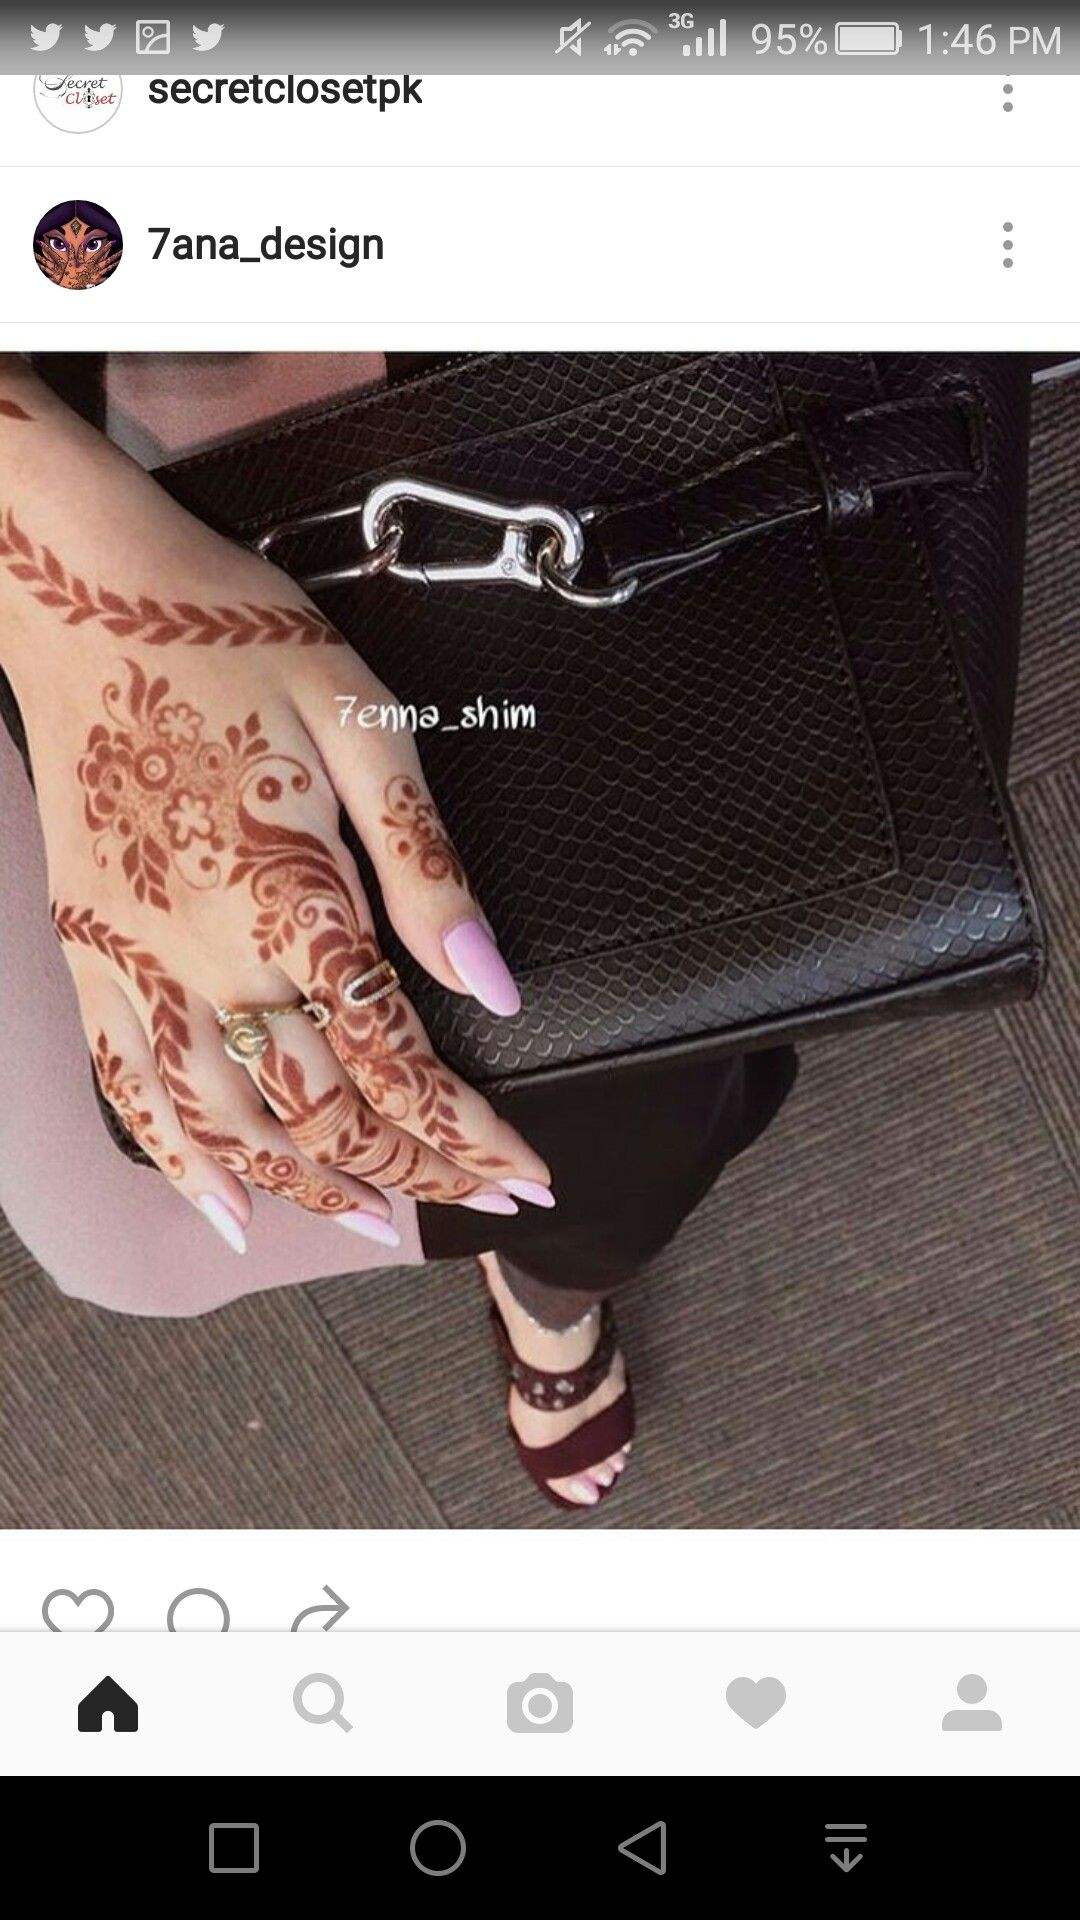 deea3cf404b7b Arabic henna design 7ana design Instagram